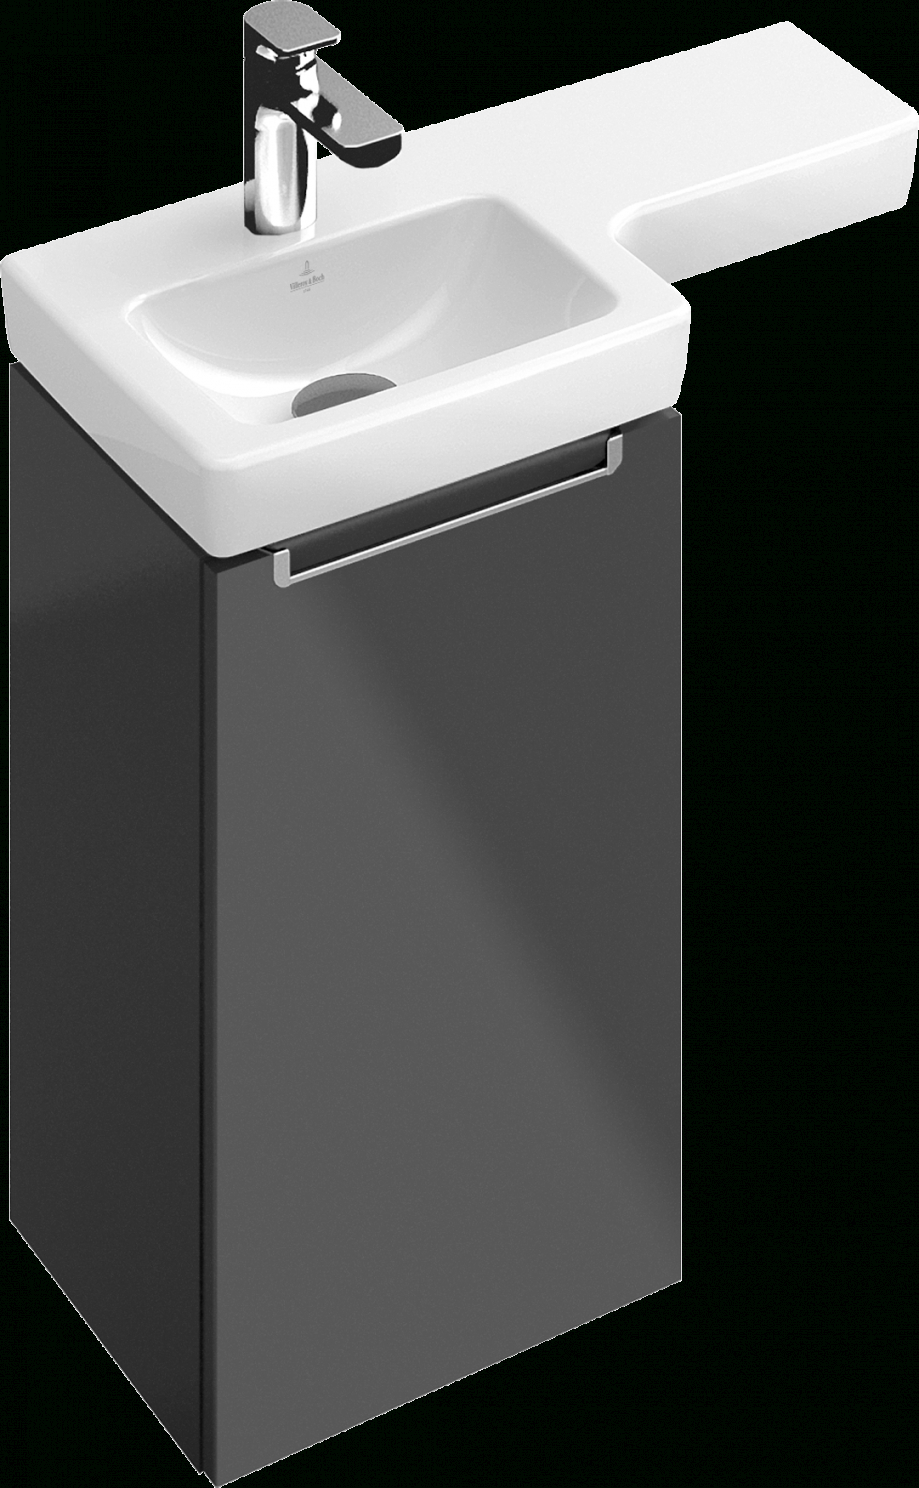 Subway 20 Waschtischunterschrank A81600  Villeroy & Boch von Villeroy Und Boch Waschtisch Mit Unterschrank Bild